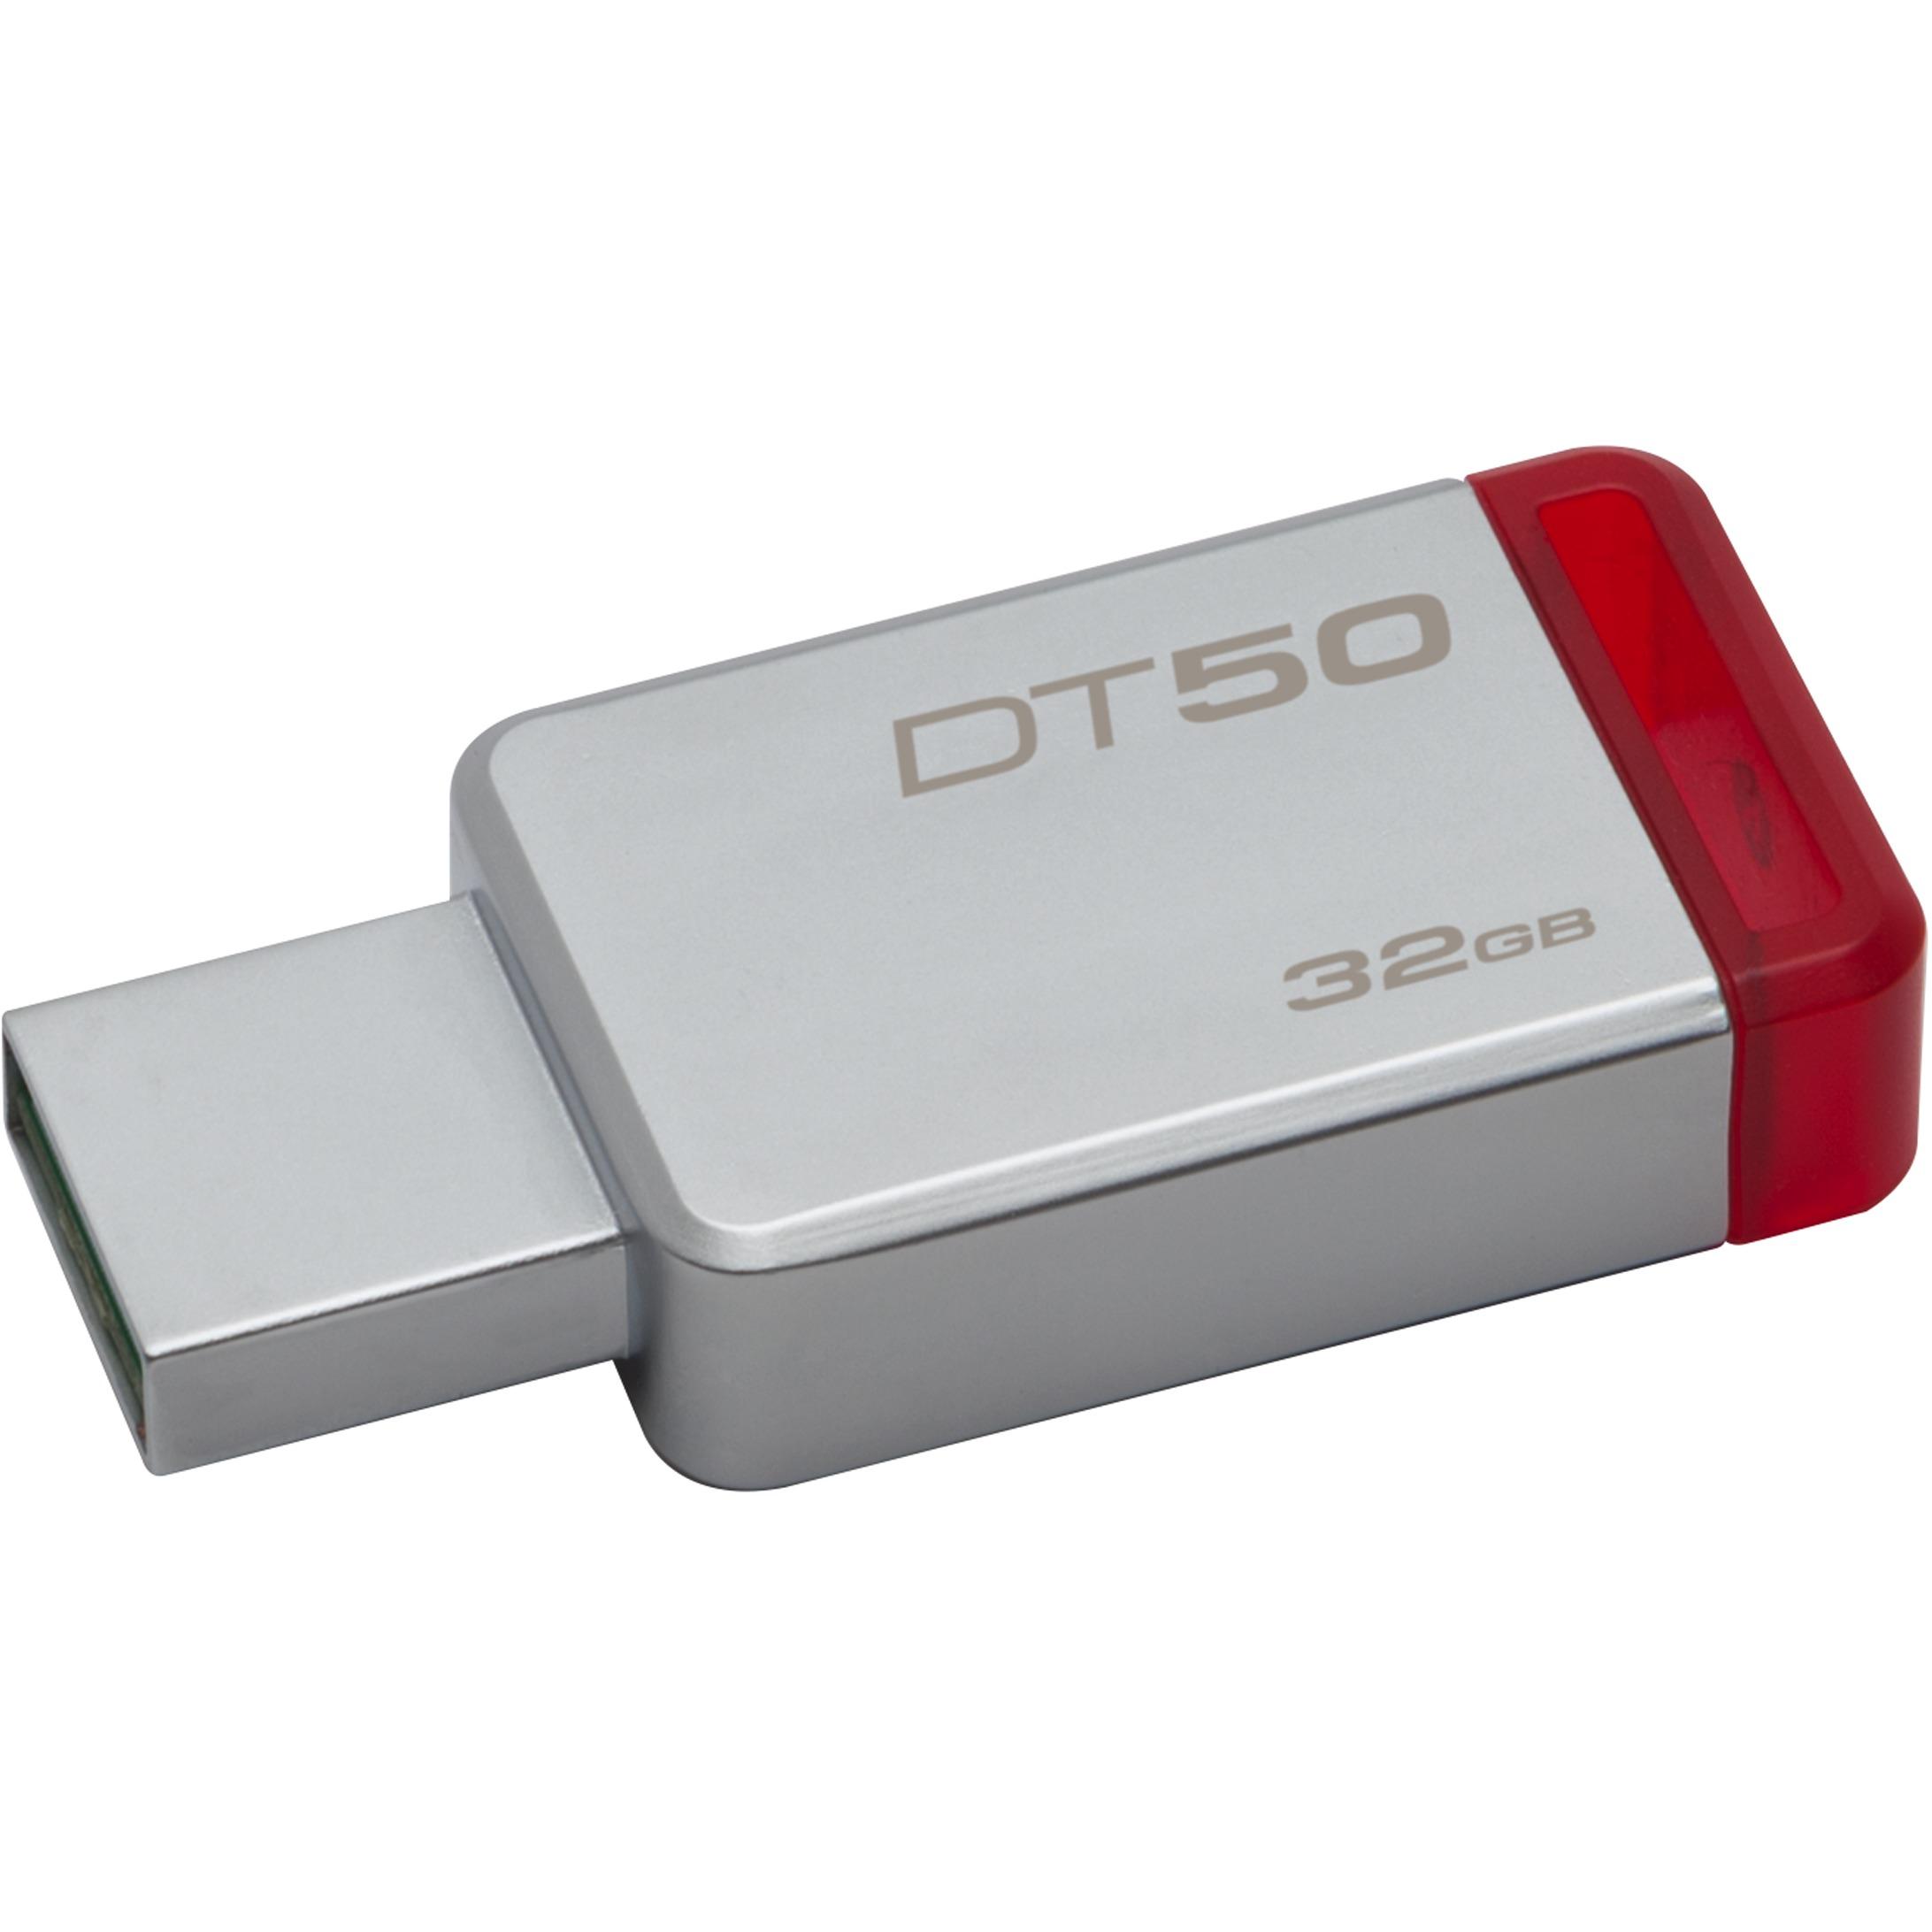 Kingston 32GB DataTraveler 50 32G DT50 USB 3.1 Gen 1 USB 3.0 110MB/s Flash Pen Thumb Drive DT50/32GB 0